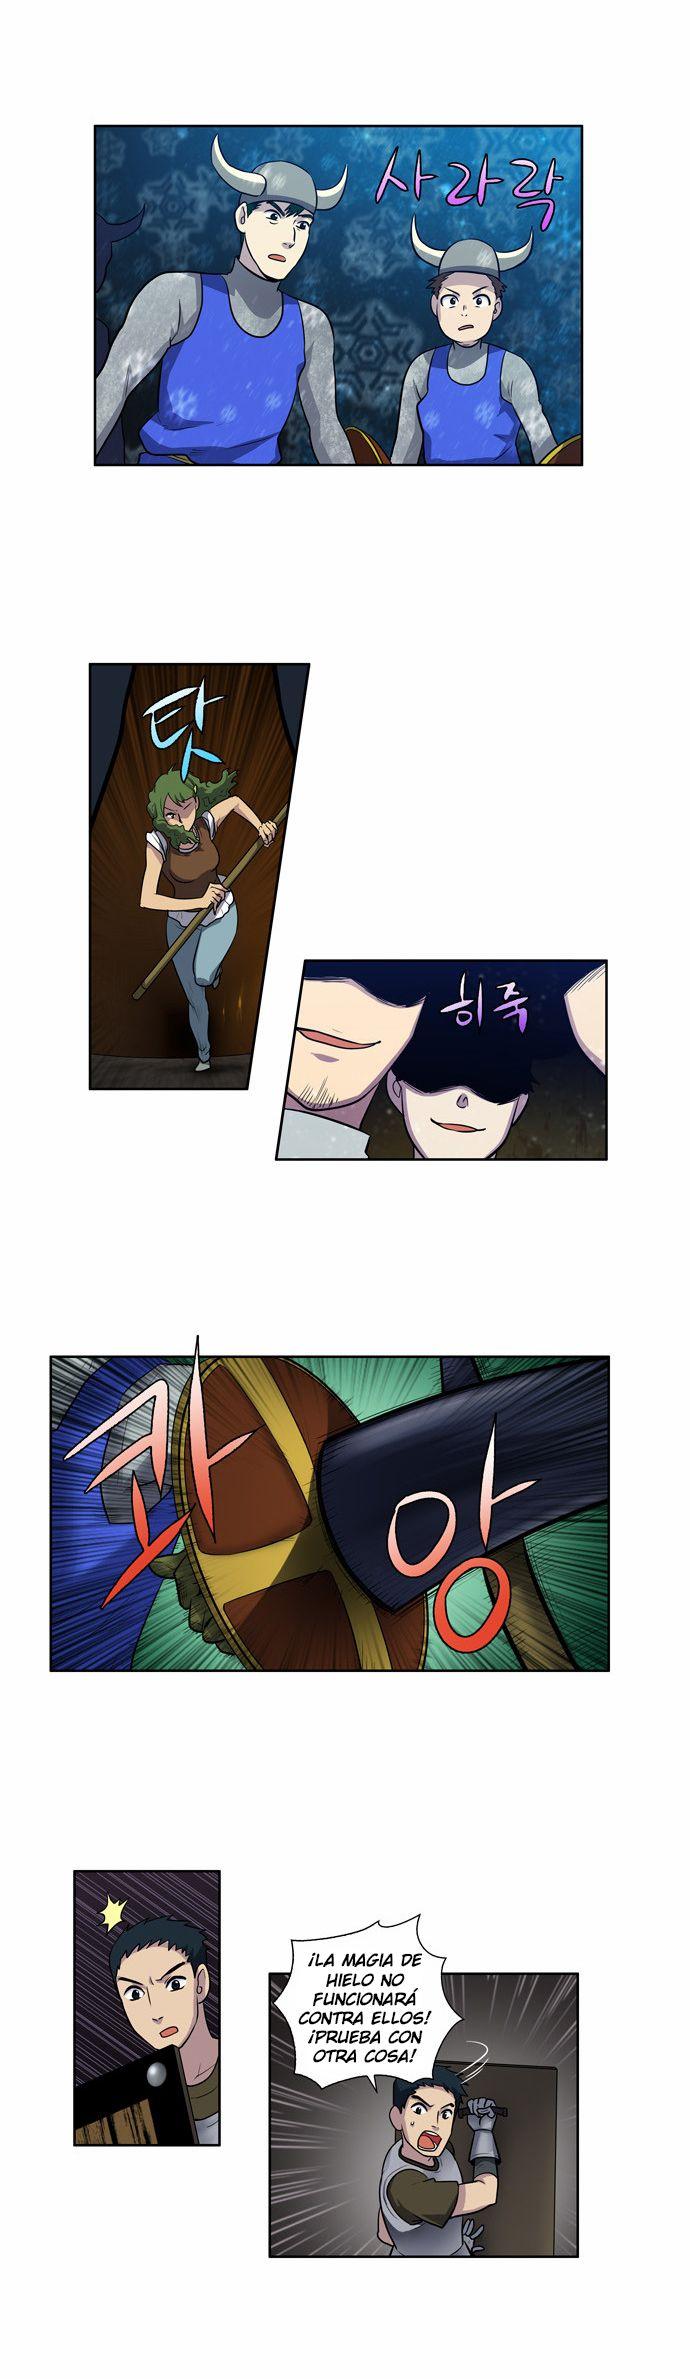 https://c5.ninemanga.com/es_manga/61/1725/479869/88386de25cbaf788591d37cc5594bedb.jpg Page 10